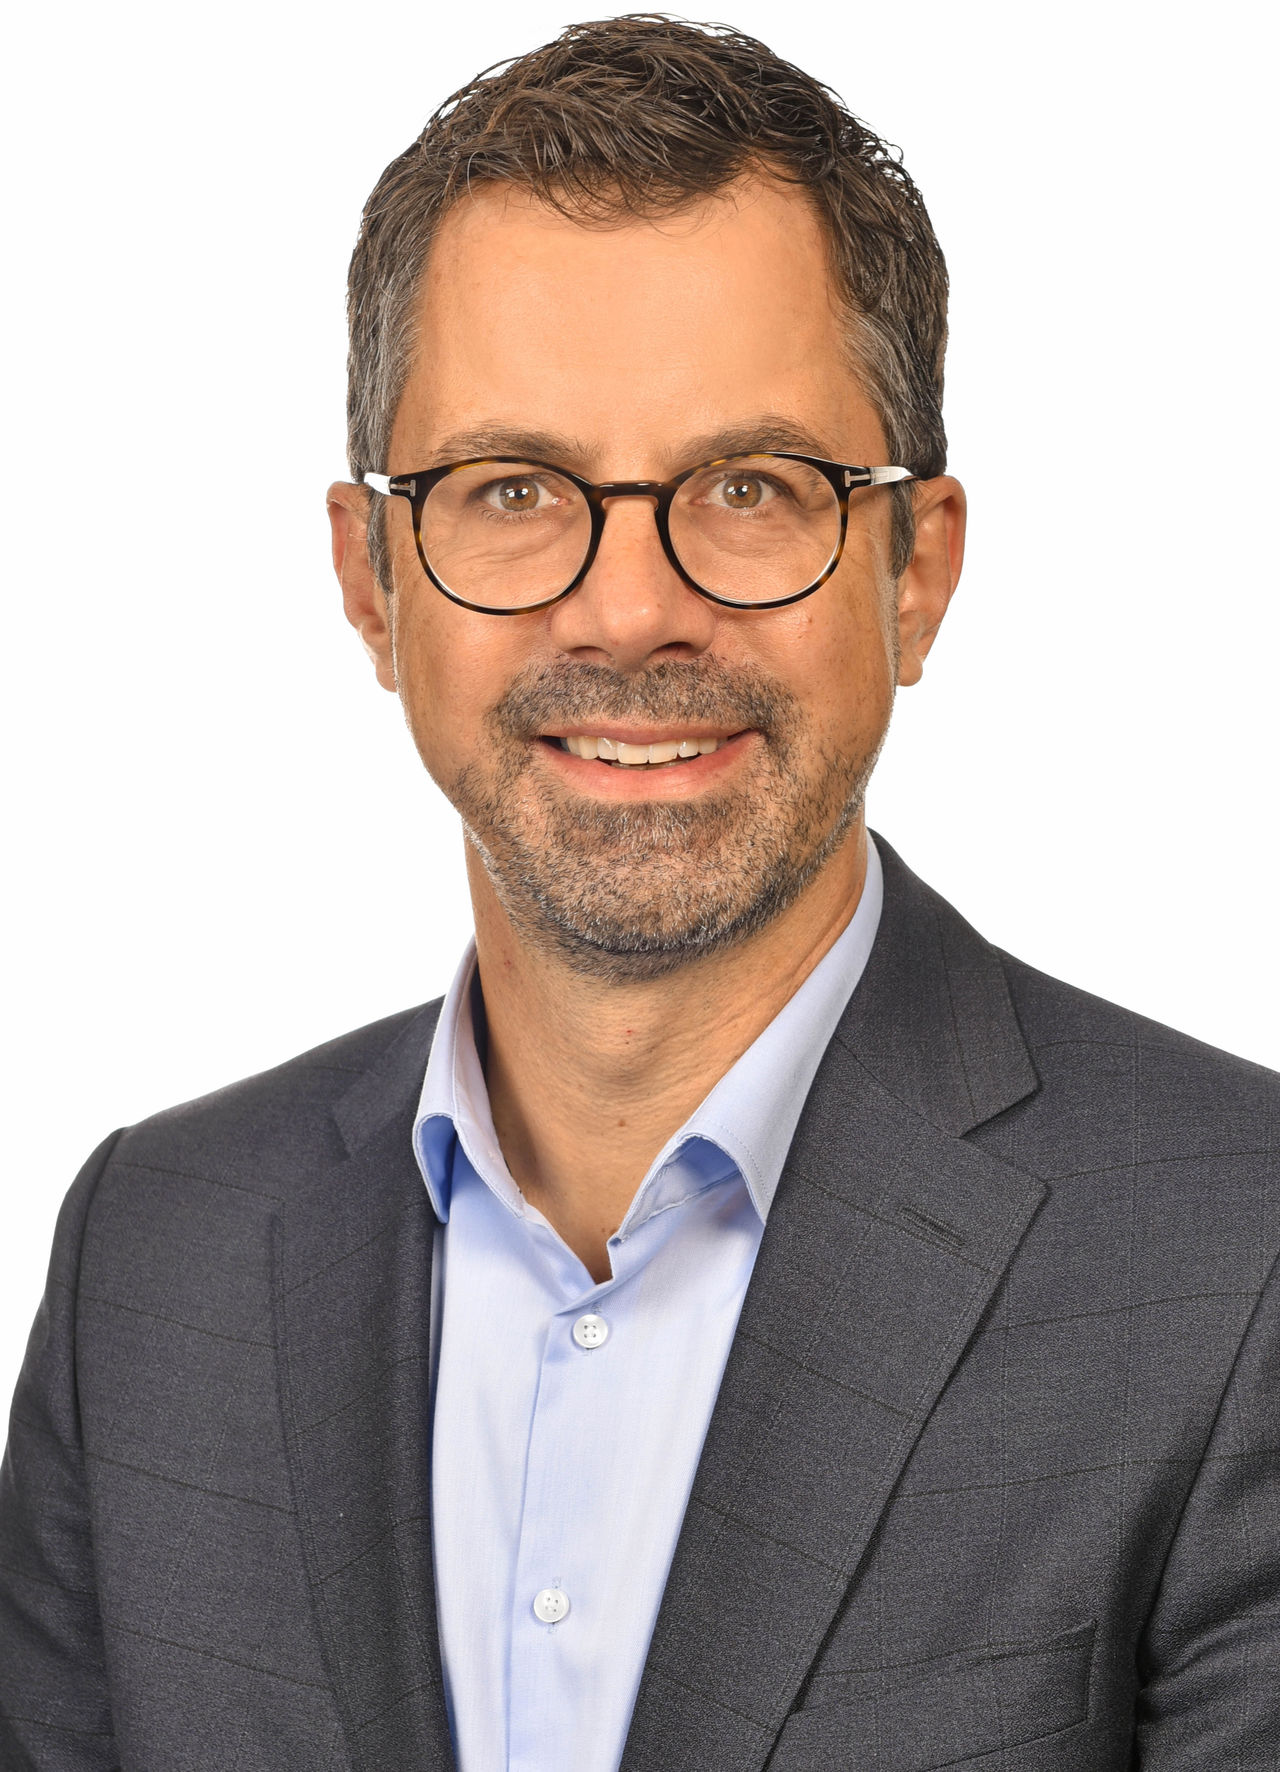 Lorenz Führlinger - Biography